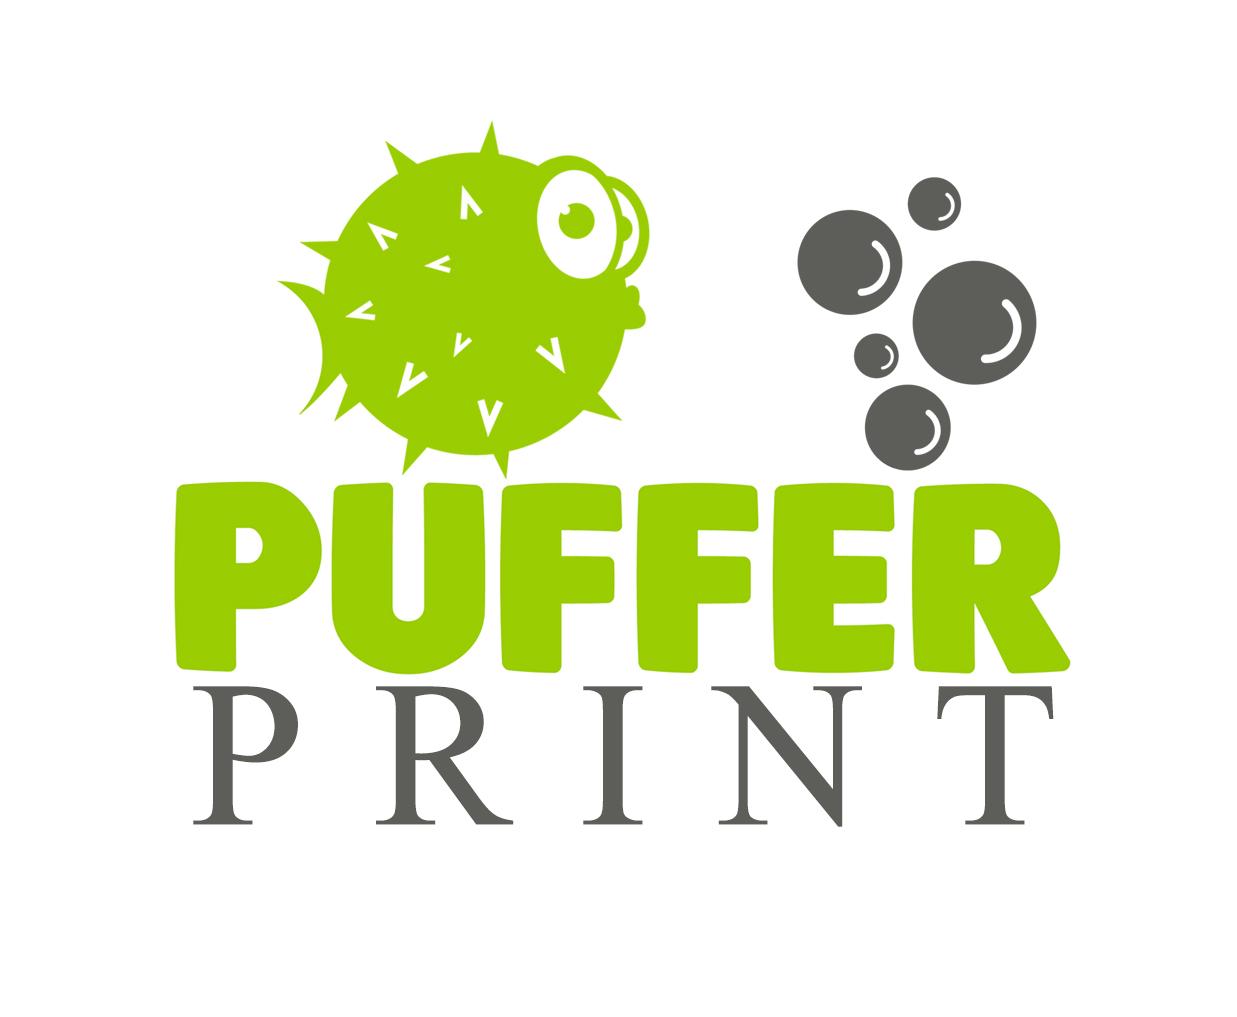 Pufferprint